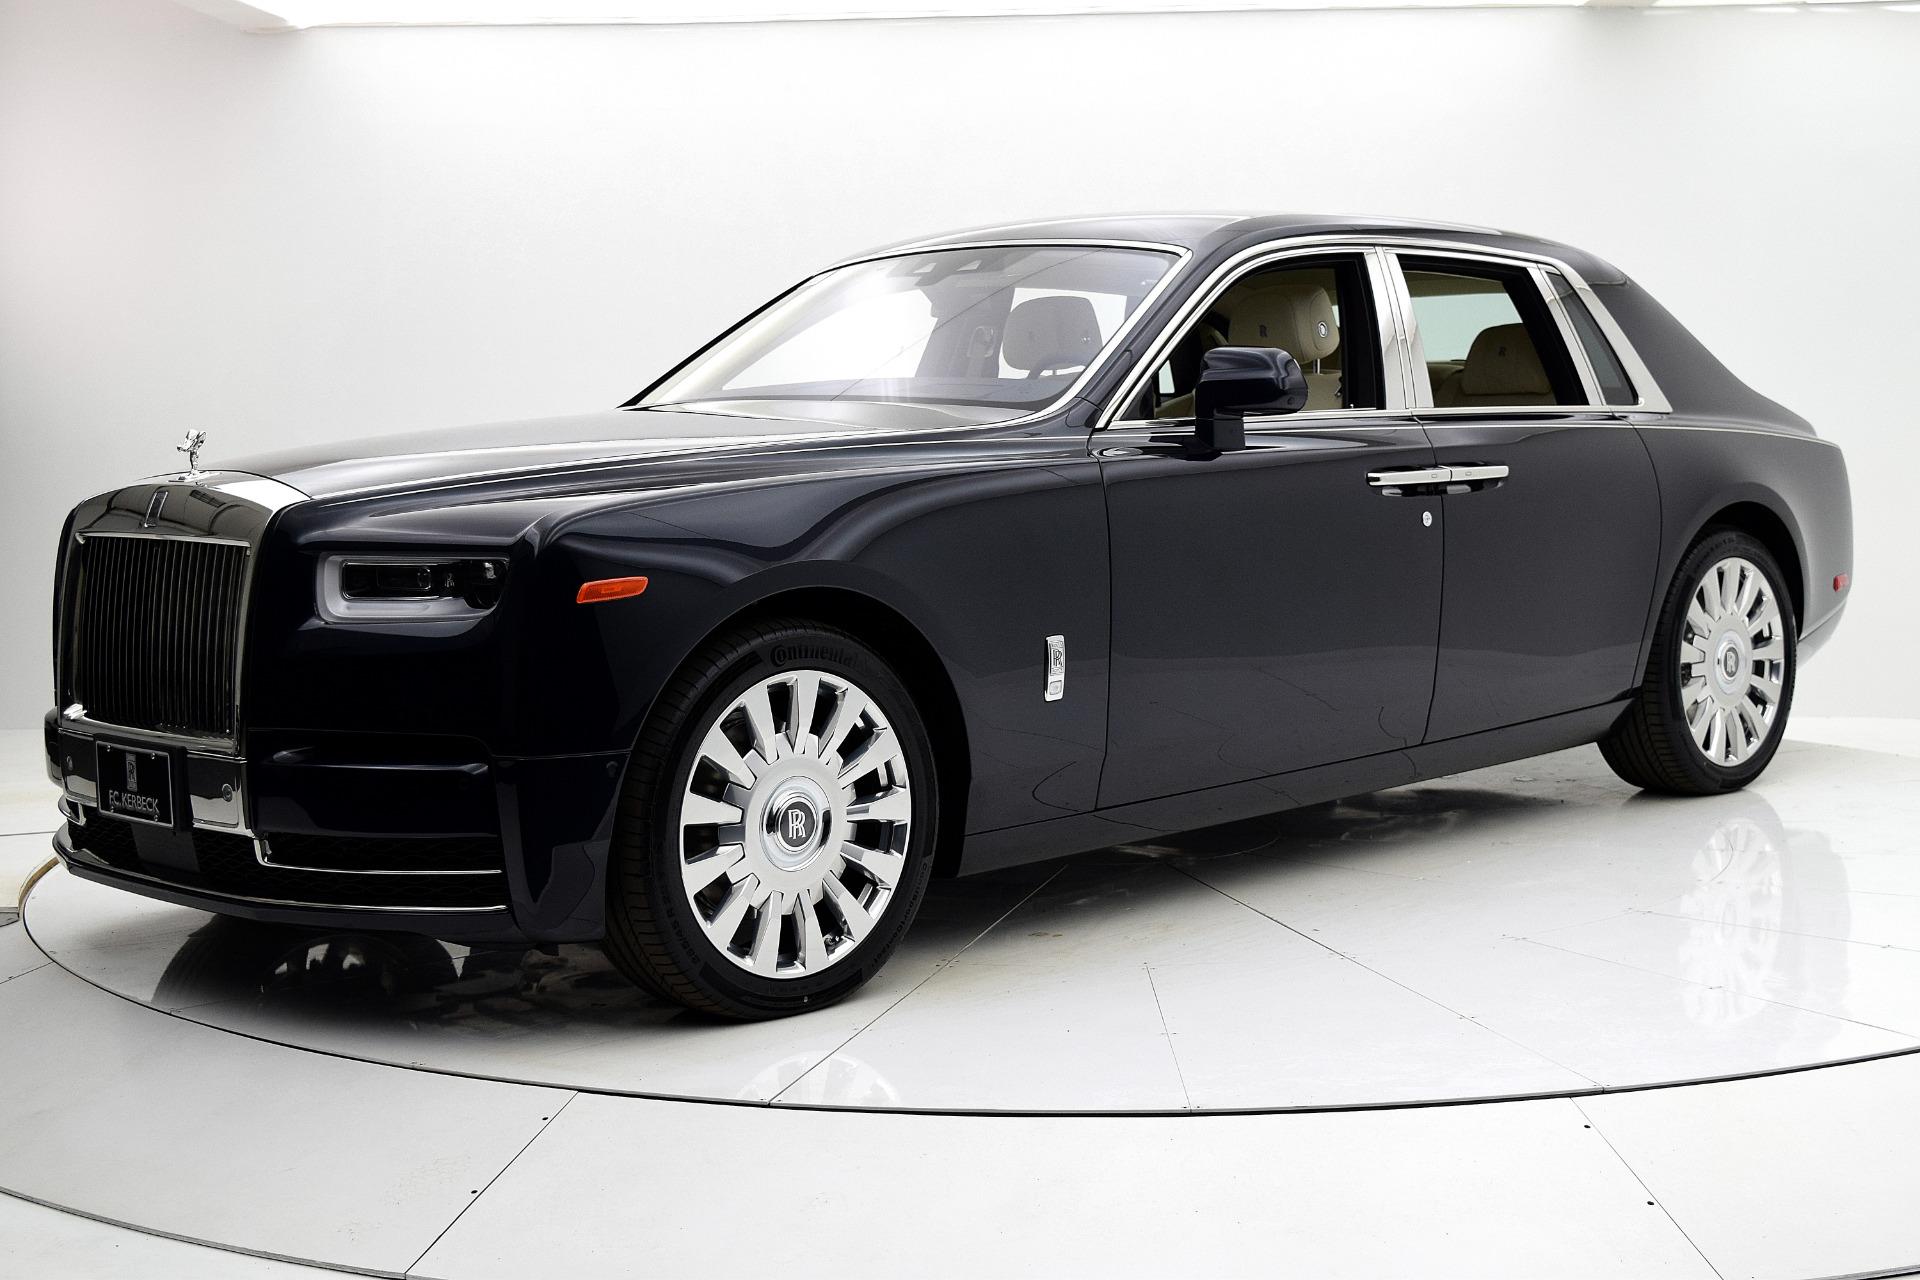 Rolls Royce Phantom Matte Black Price